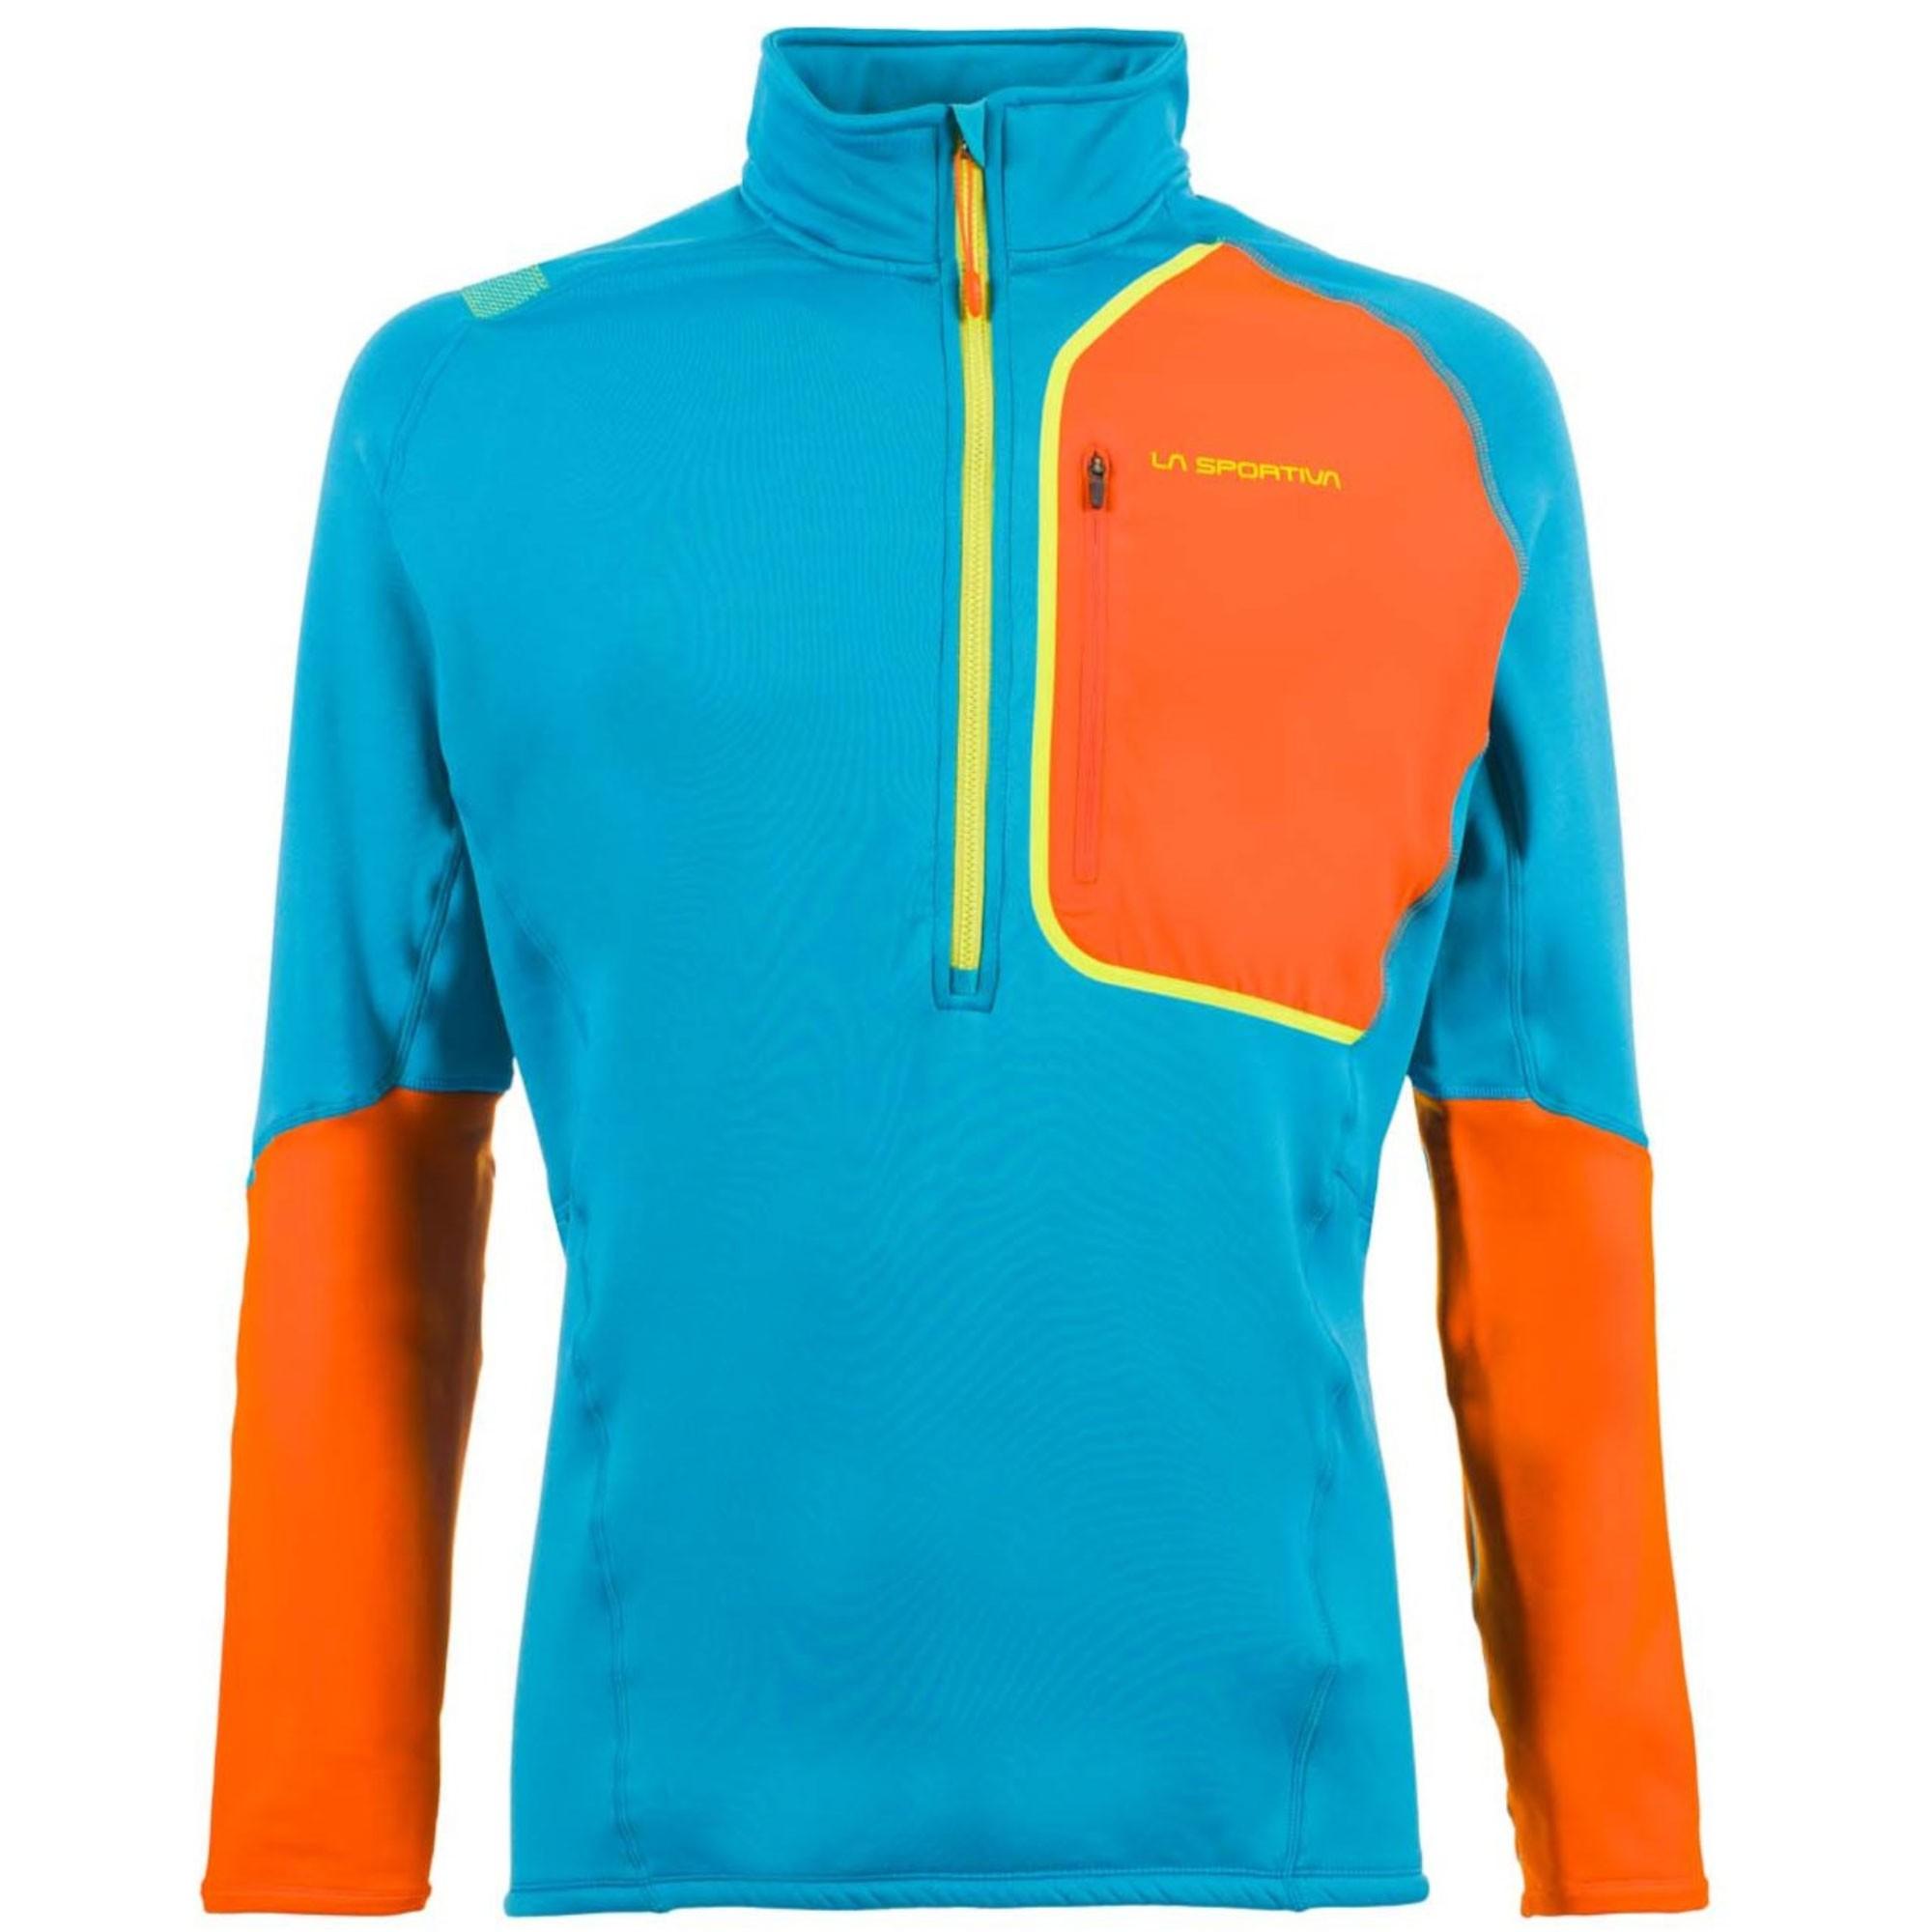 LA SPORTIVA Millennium Pullover - Tropic Blue/Pumpkin